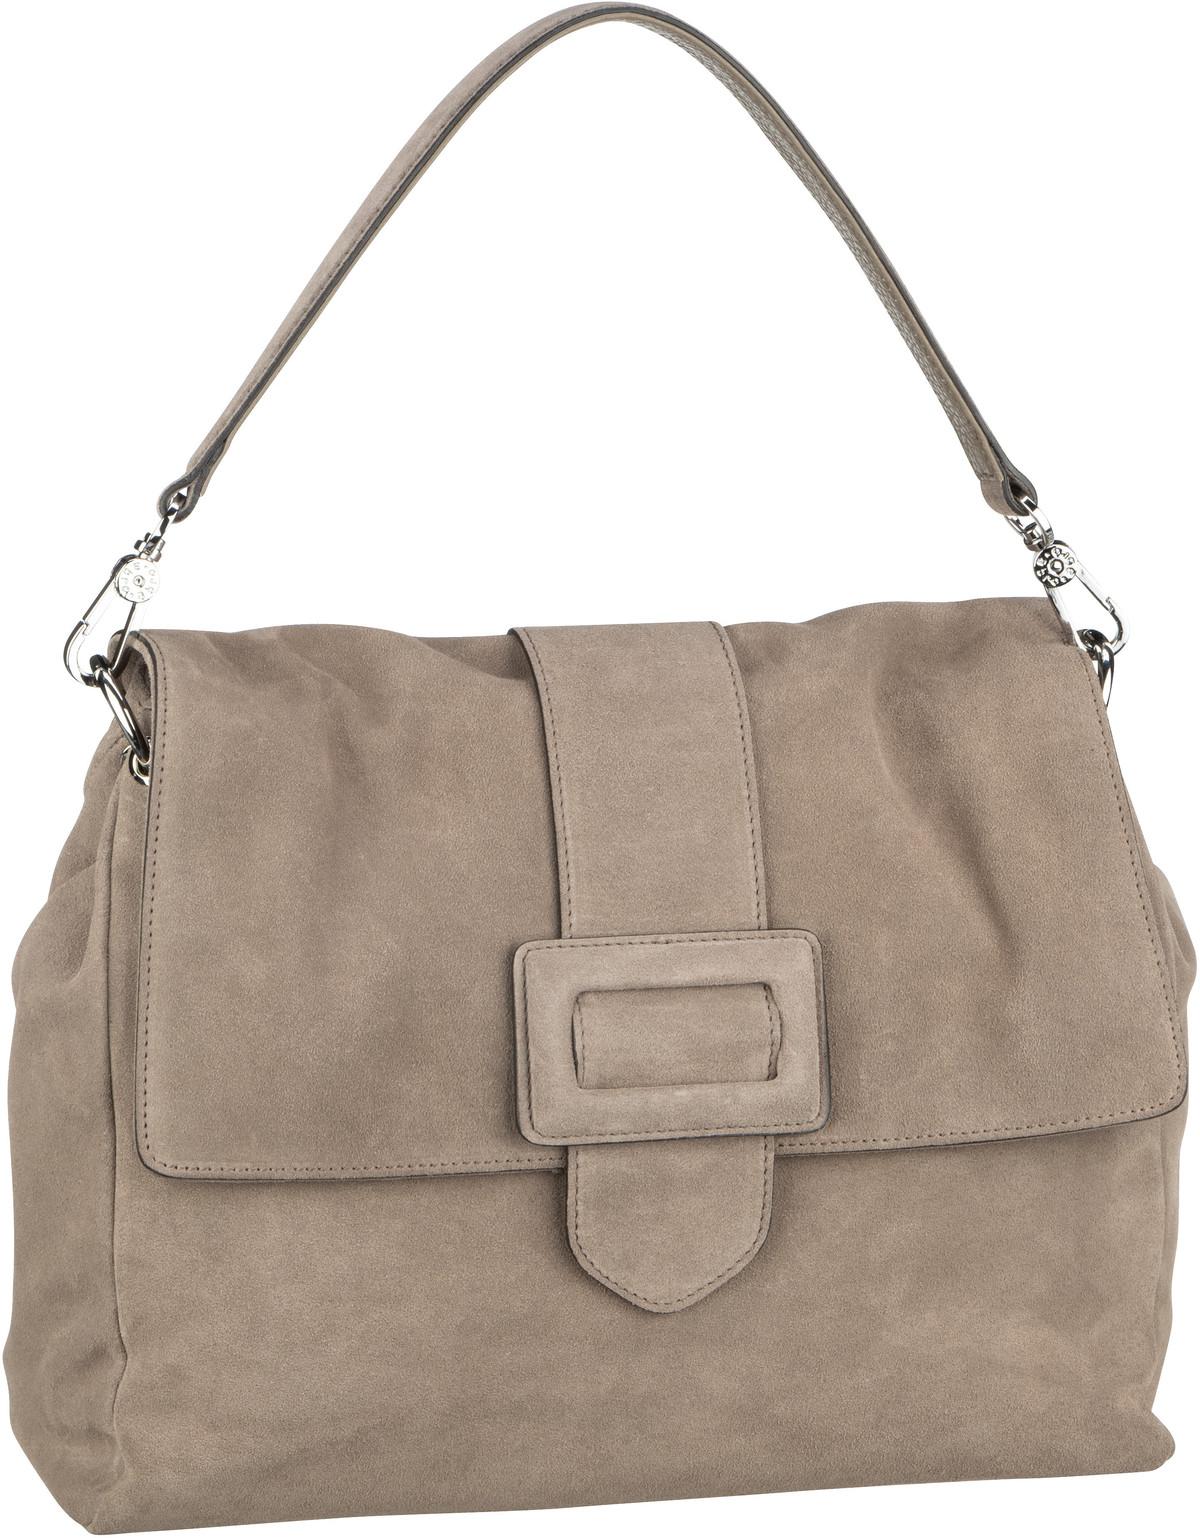 Handtasche Suede 28612 Taupe